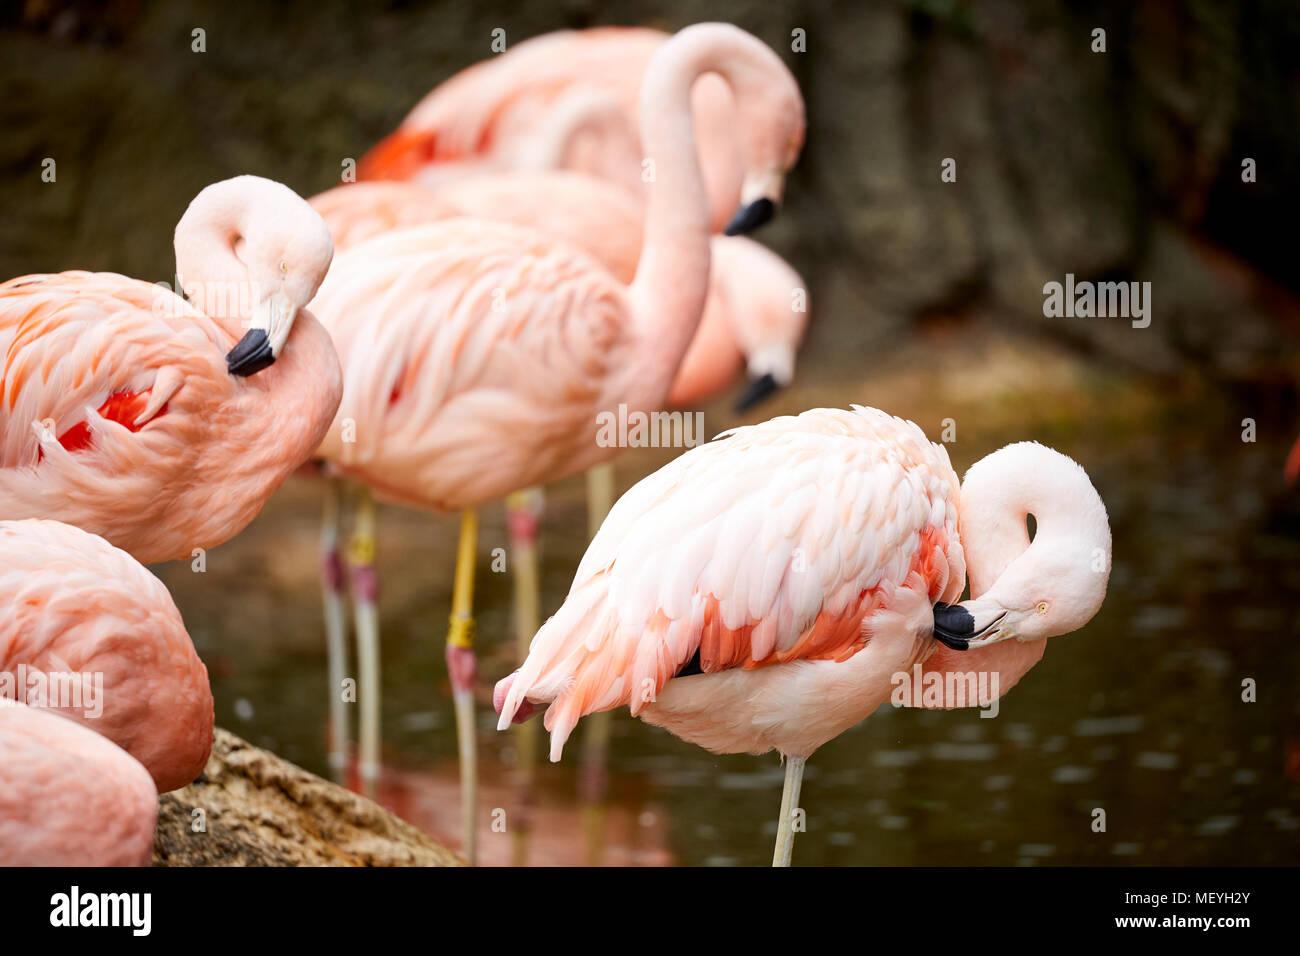 Atlanta capital of the U.S. state of Georgia,  Atlanta Zoo zoological park Flamingos or flamingos in water - Stock Image